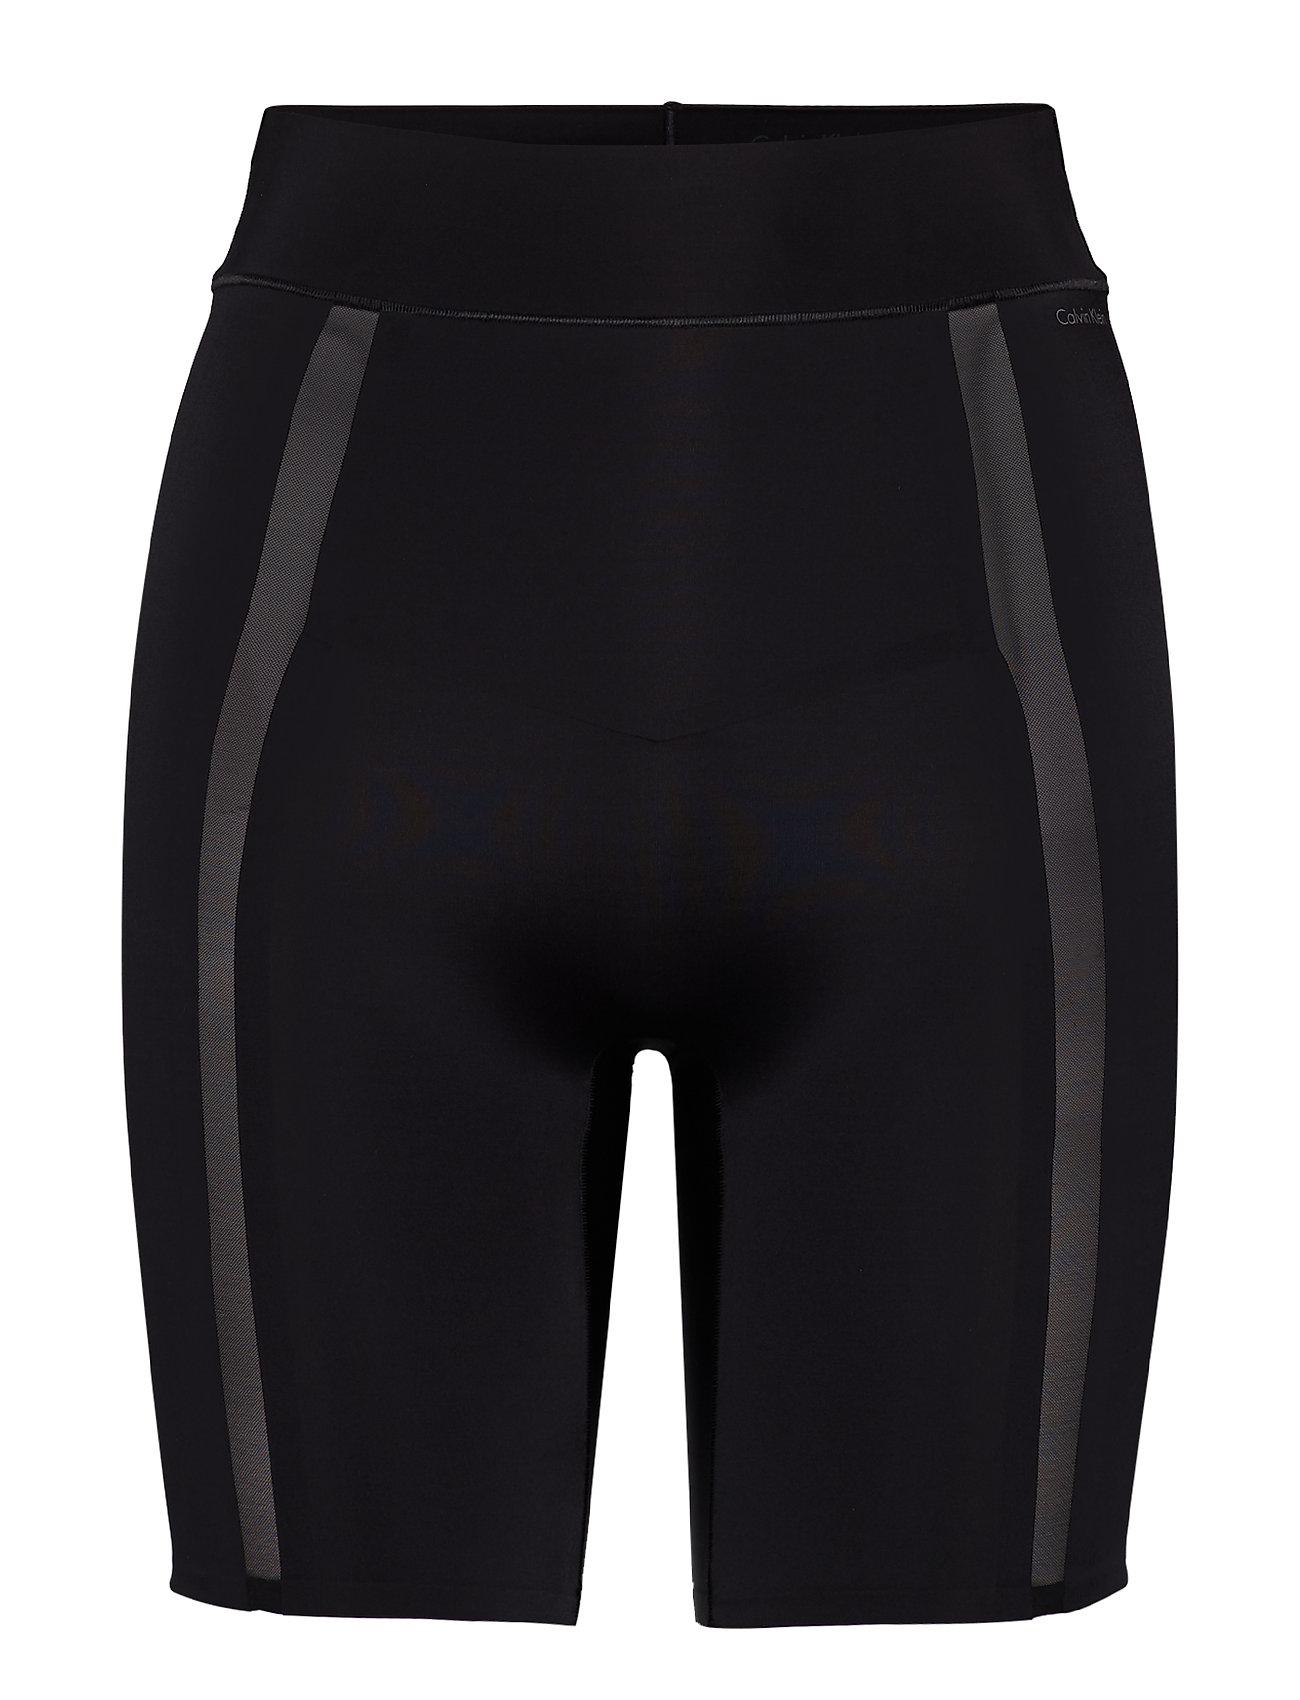 Calvin Klein SHORT - BLACK